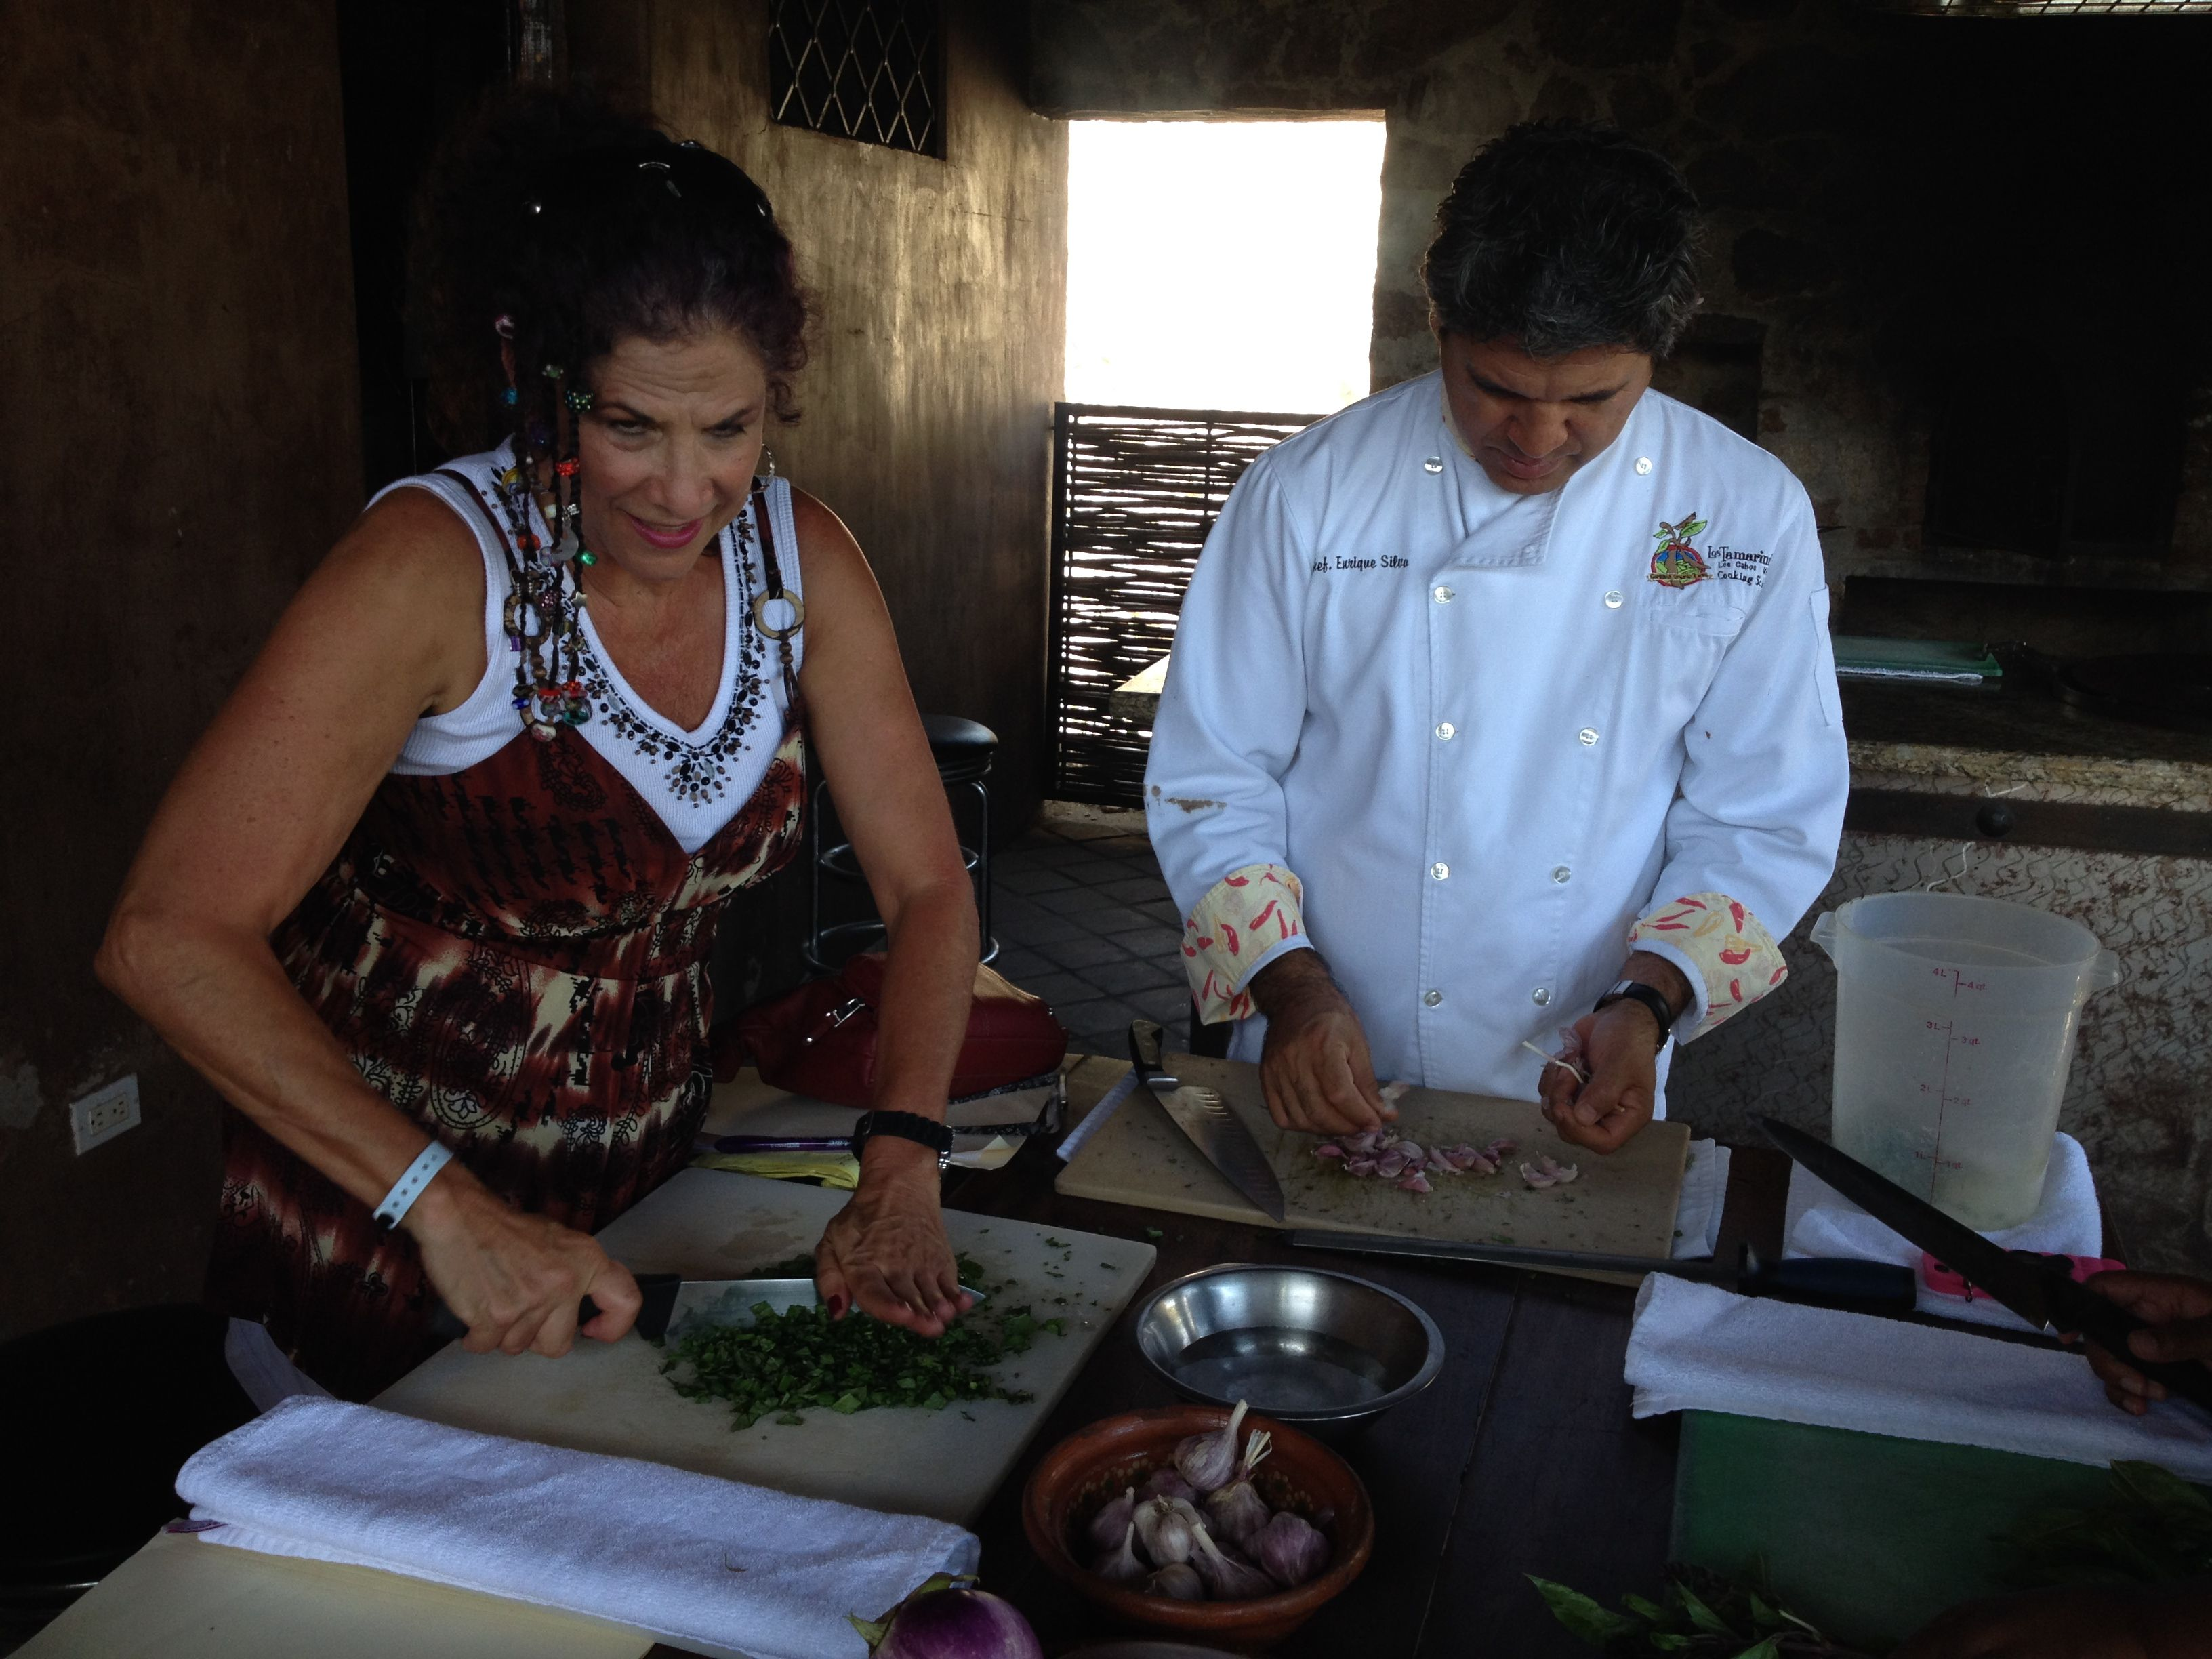 publix cooking classes orlando